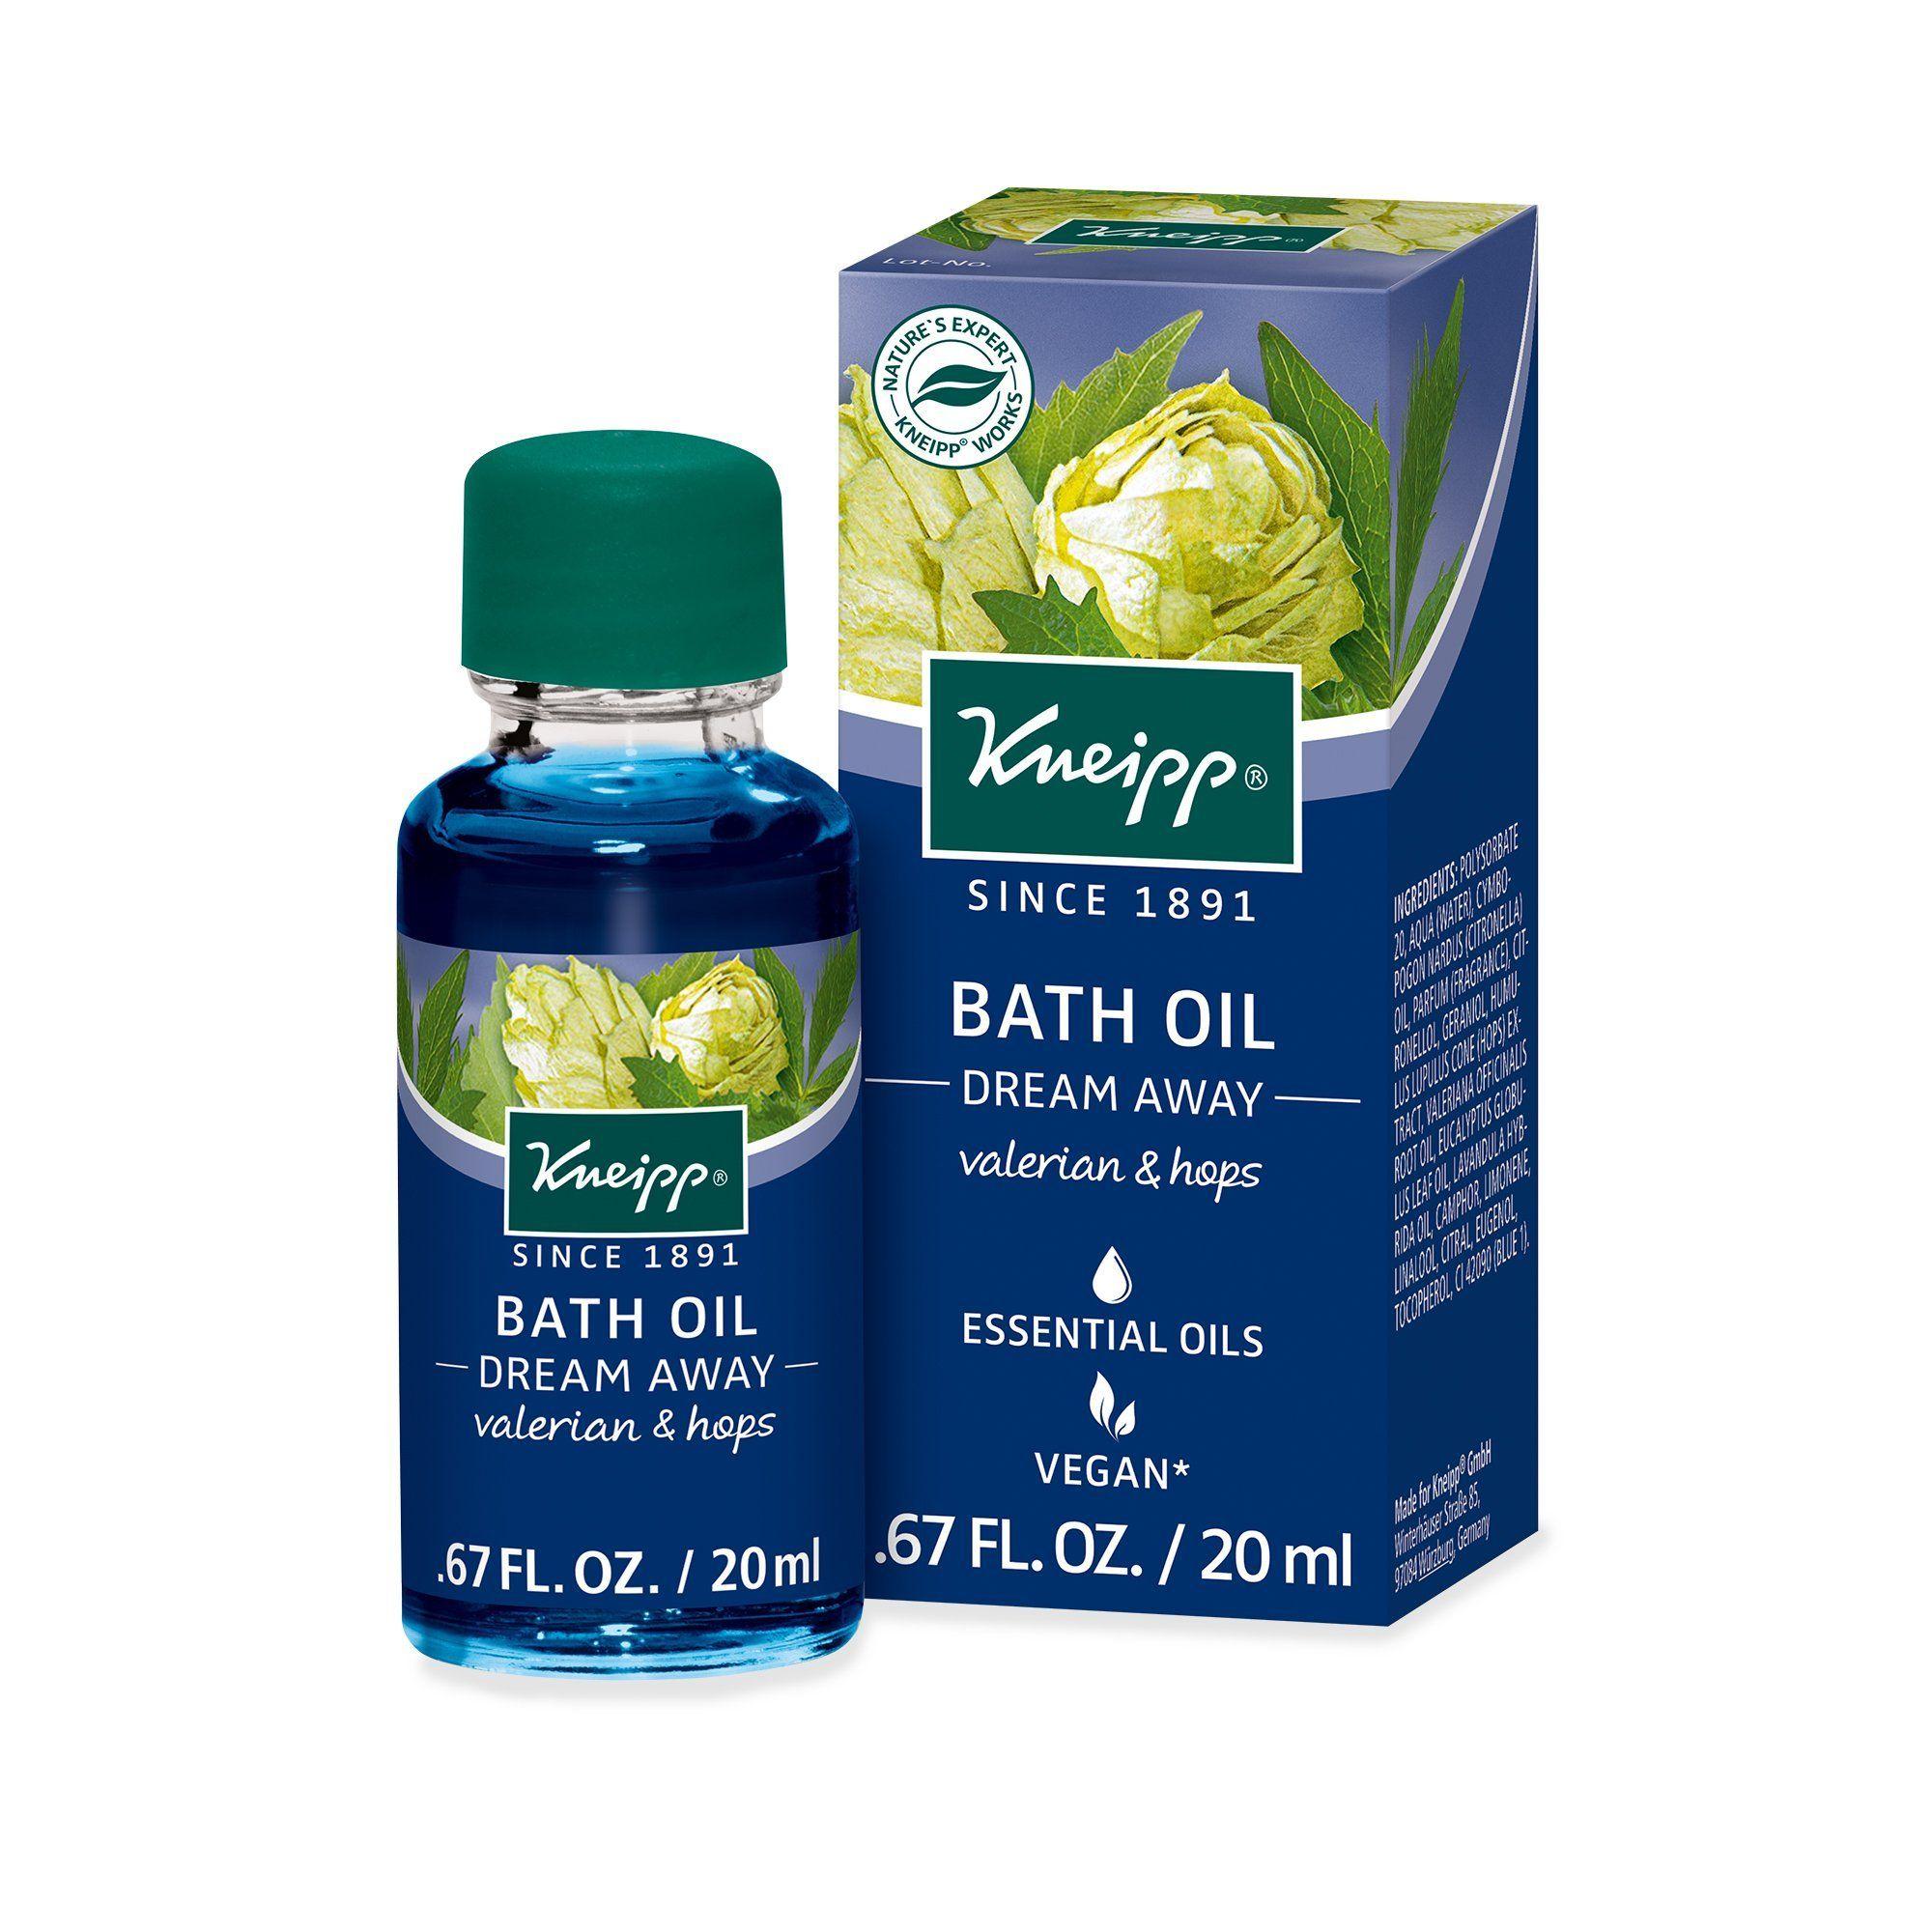 Kneipp Dream Away Bath Oil Herbal Bath Essential Oil Plants Herbalism